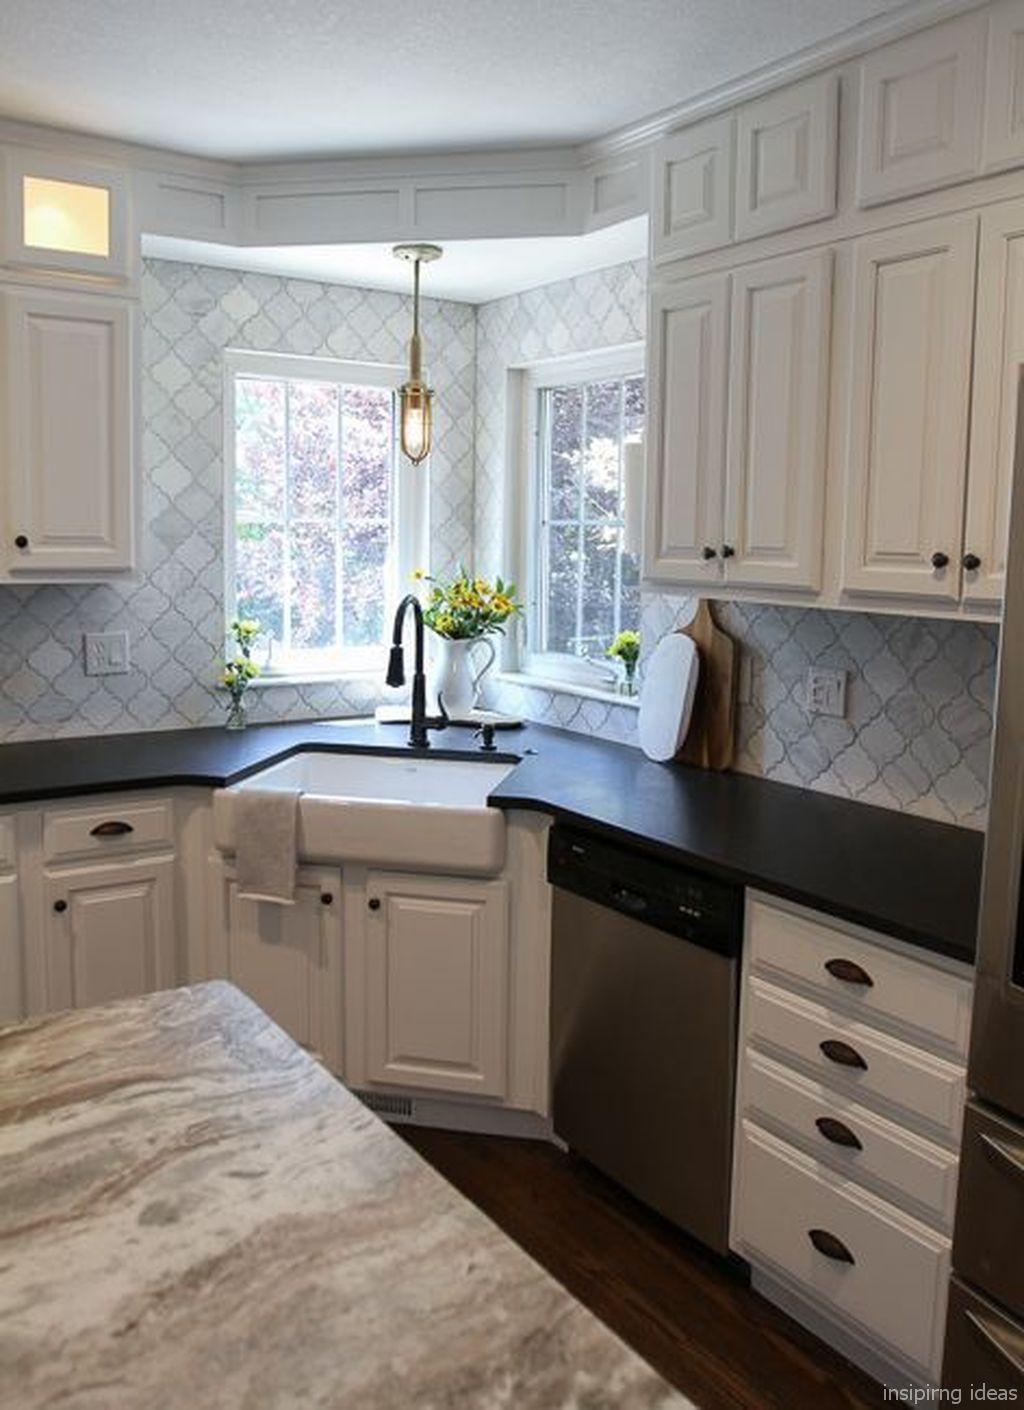 Best Adorable 80 Beautiful Modern Farmhouse Kitchen Backsplash 400 x 300